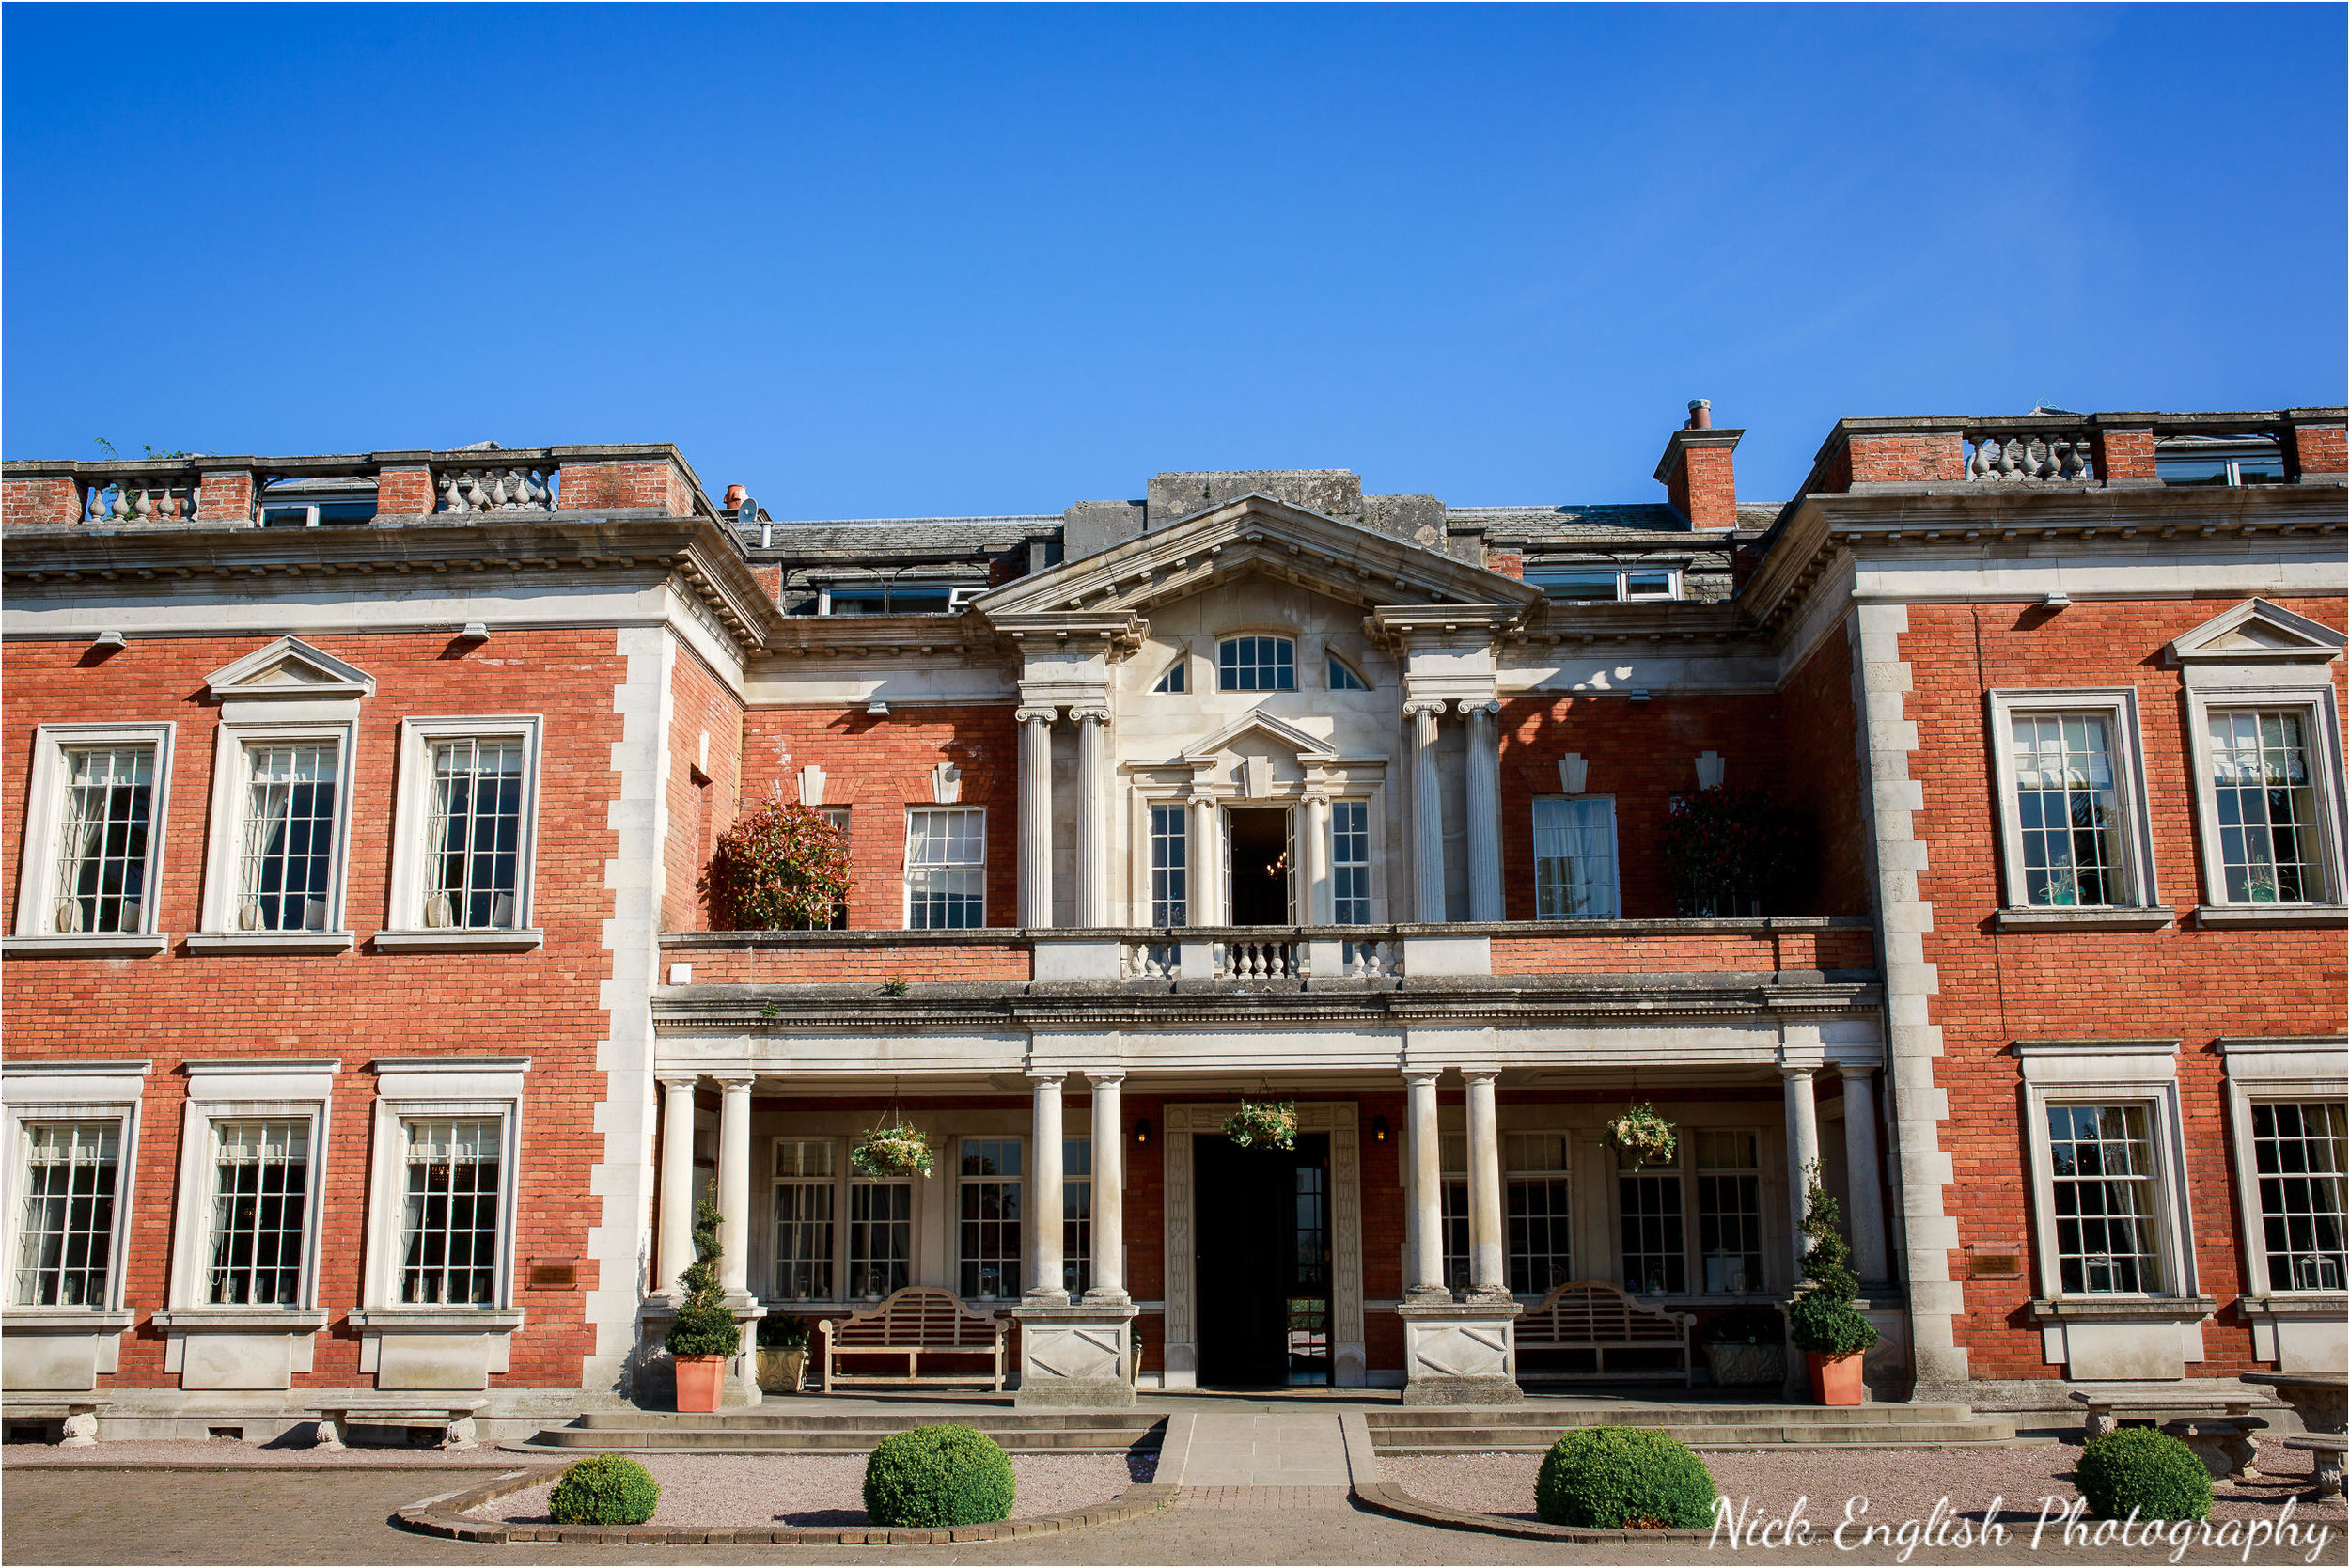 Alison James Wedding Photographs at Eaves Hall West Bradford 3jpg.jpeg